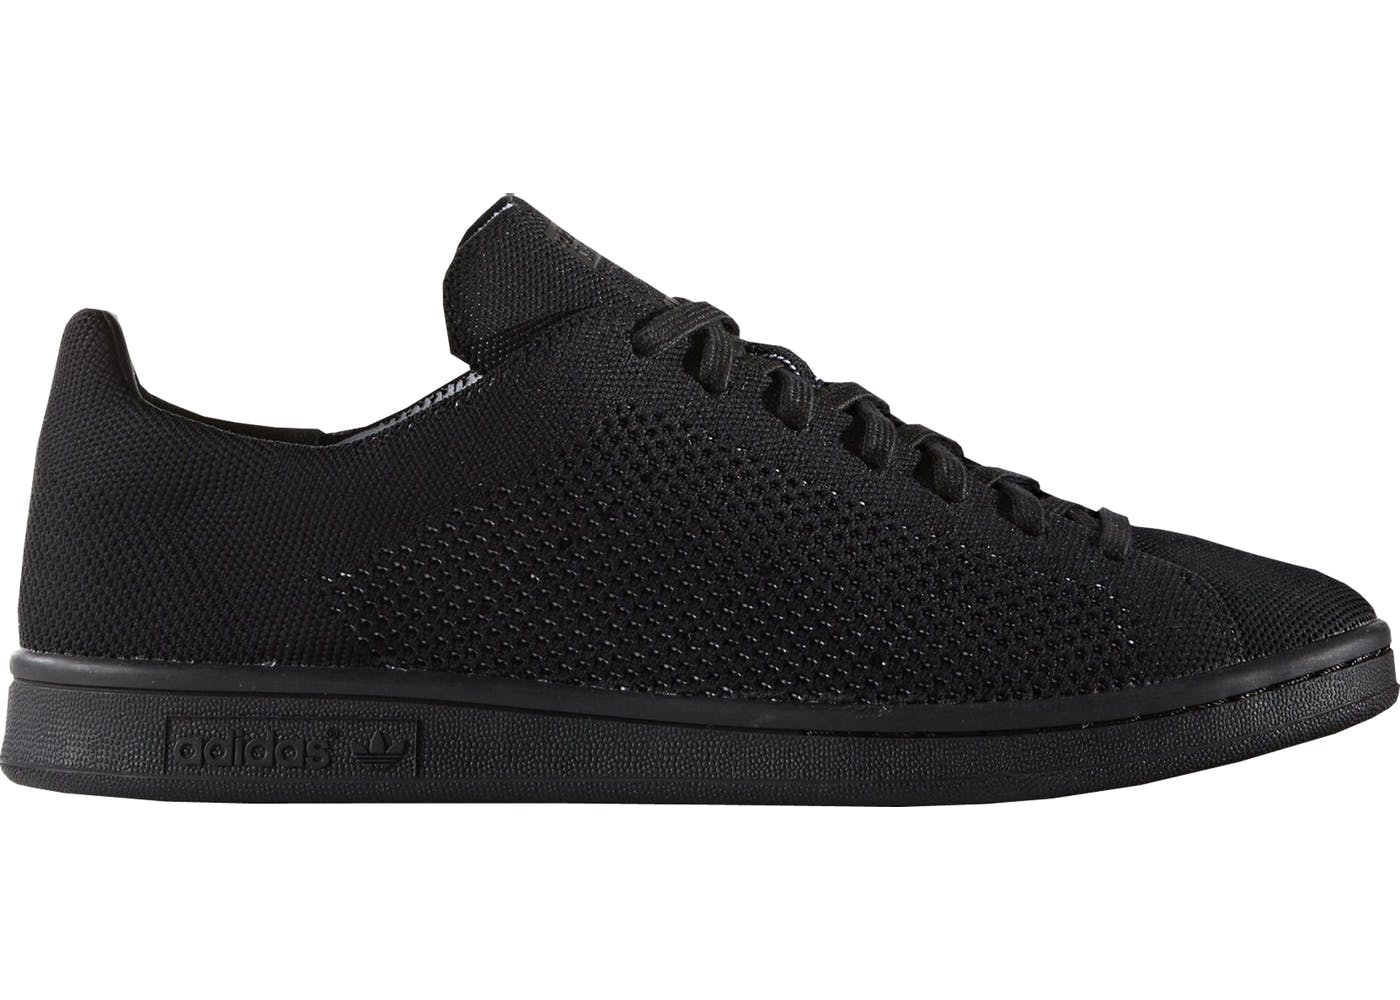 adidas stan smith primeknit triple black. Black Bedroom Furniture Sets. Home Design Ideas